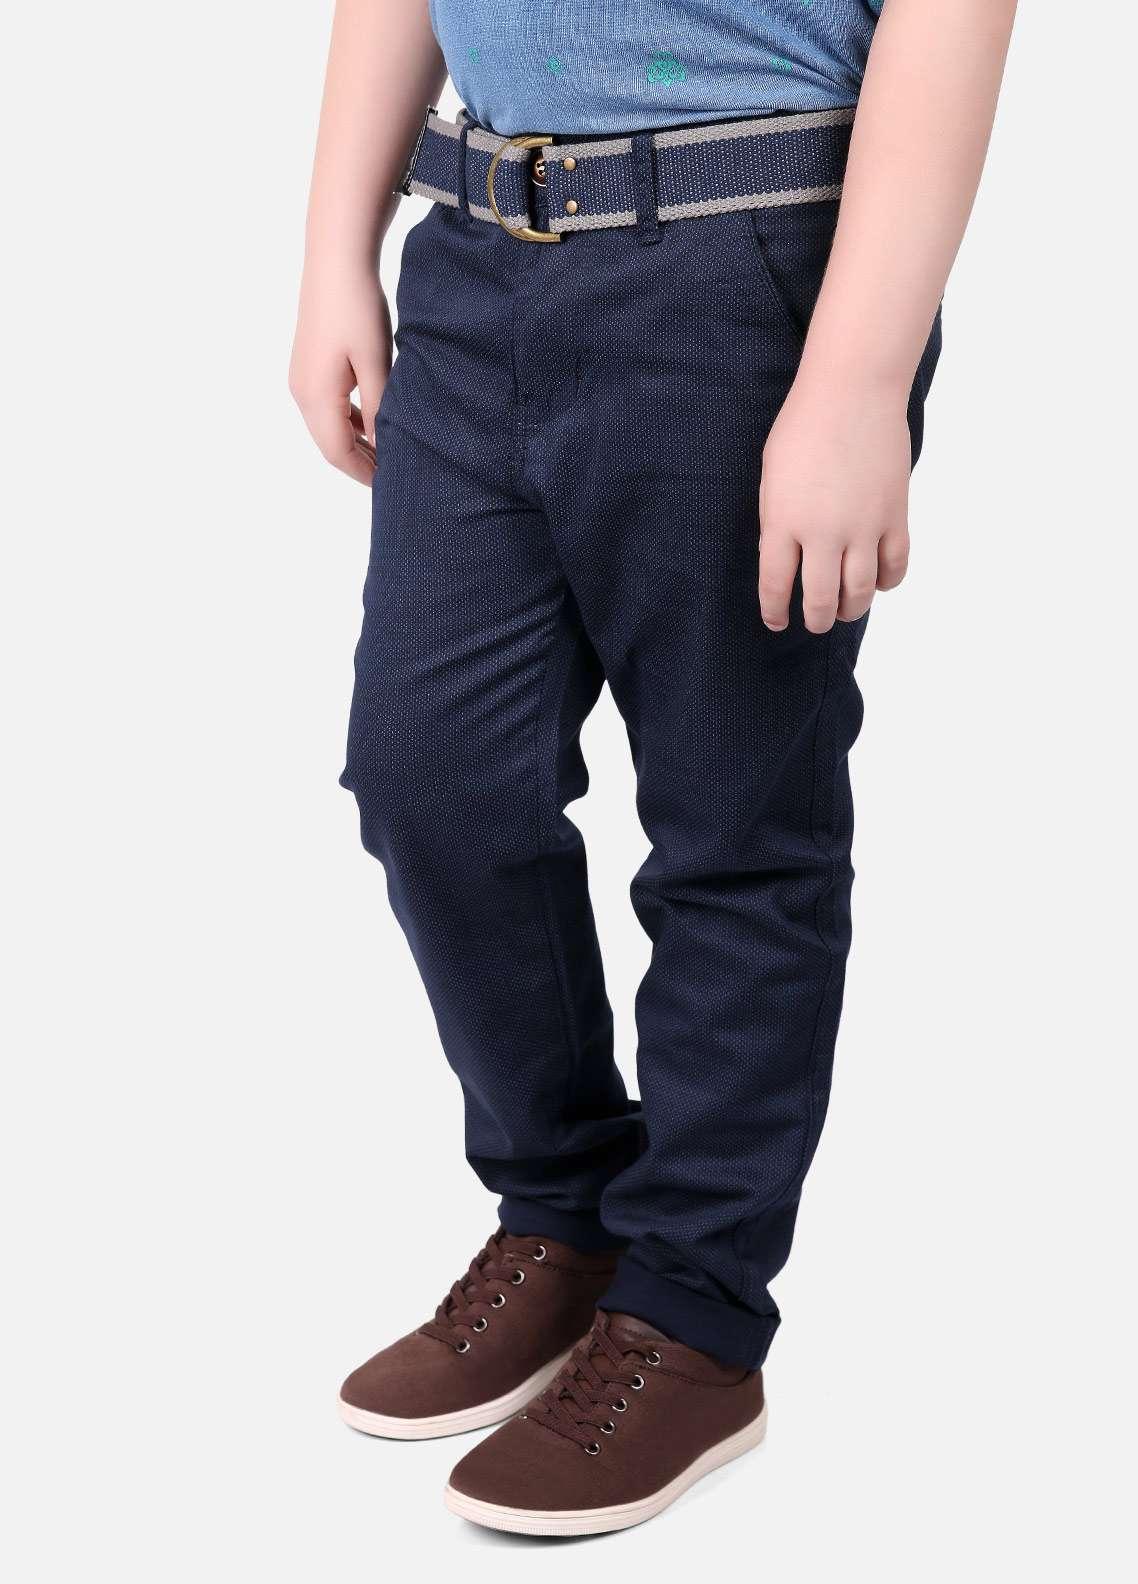 Edenrobe Cotton Printed Pants for Boys - Navy Blue EDK18P 5716